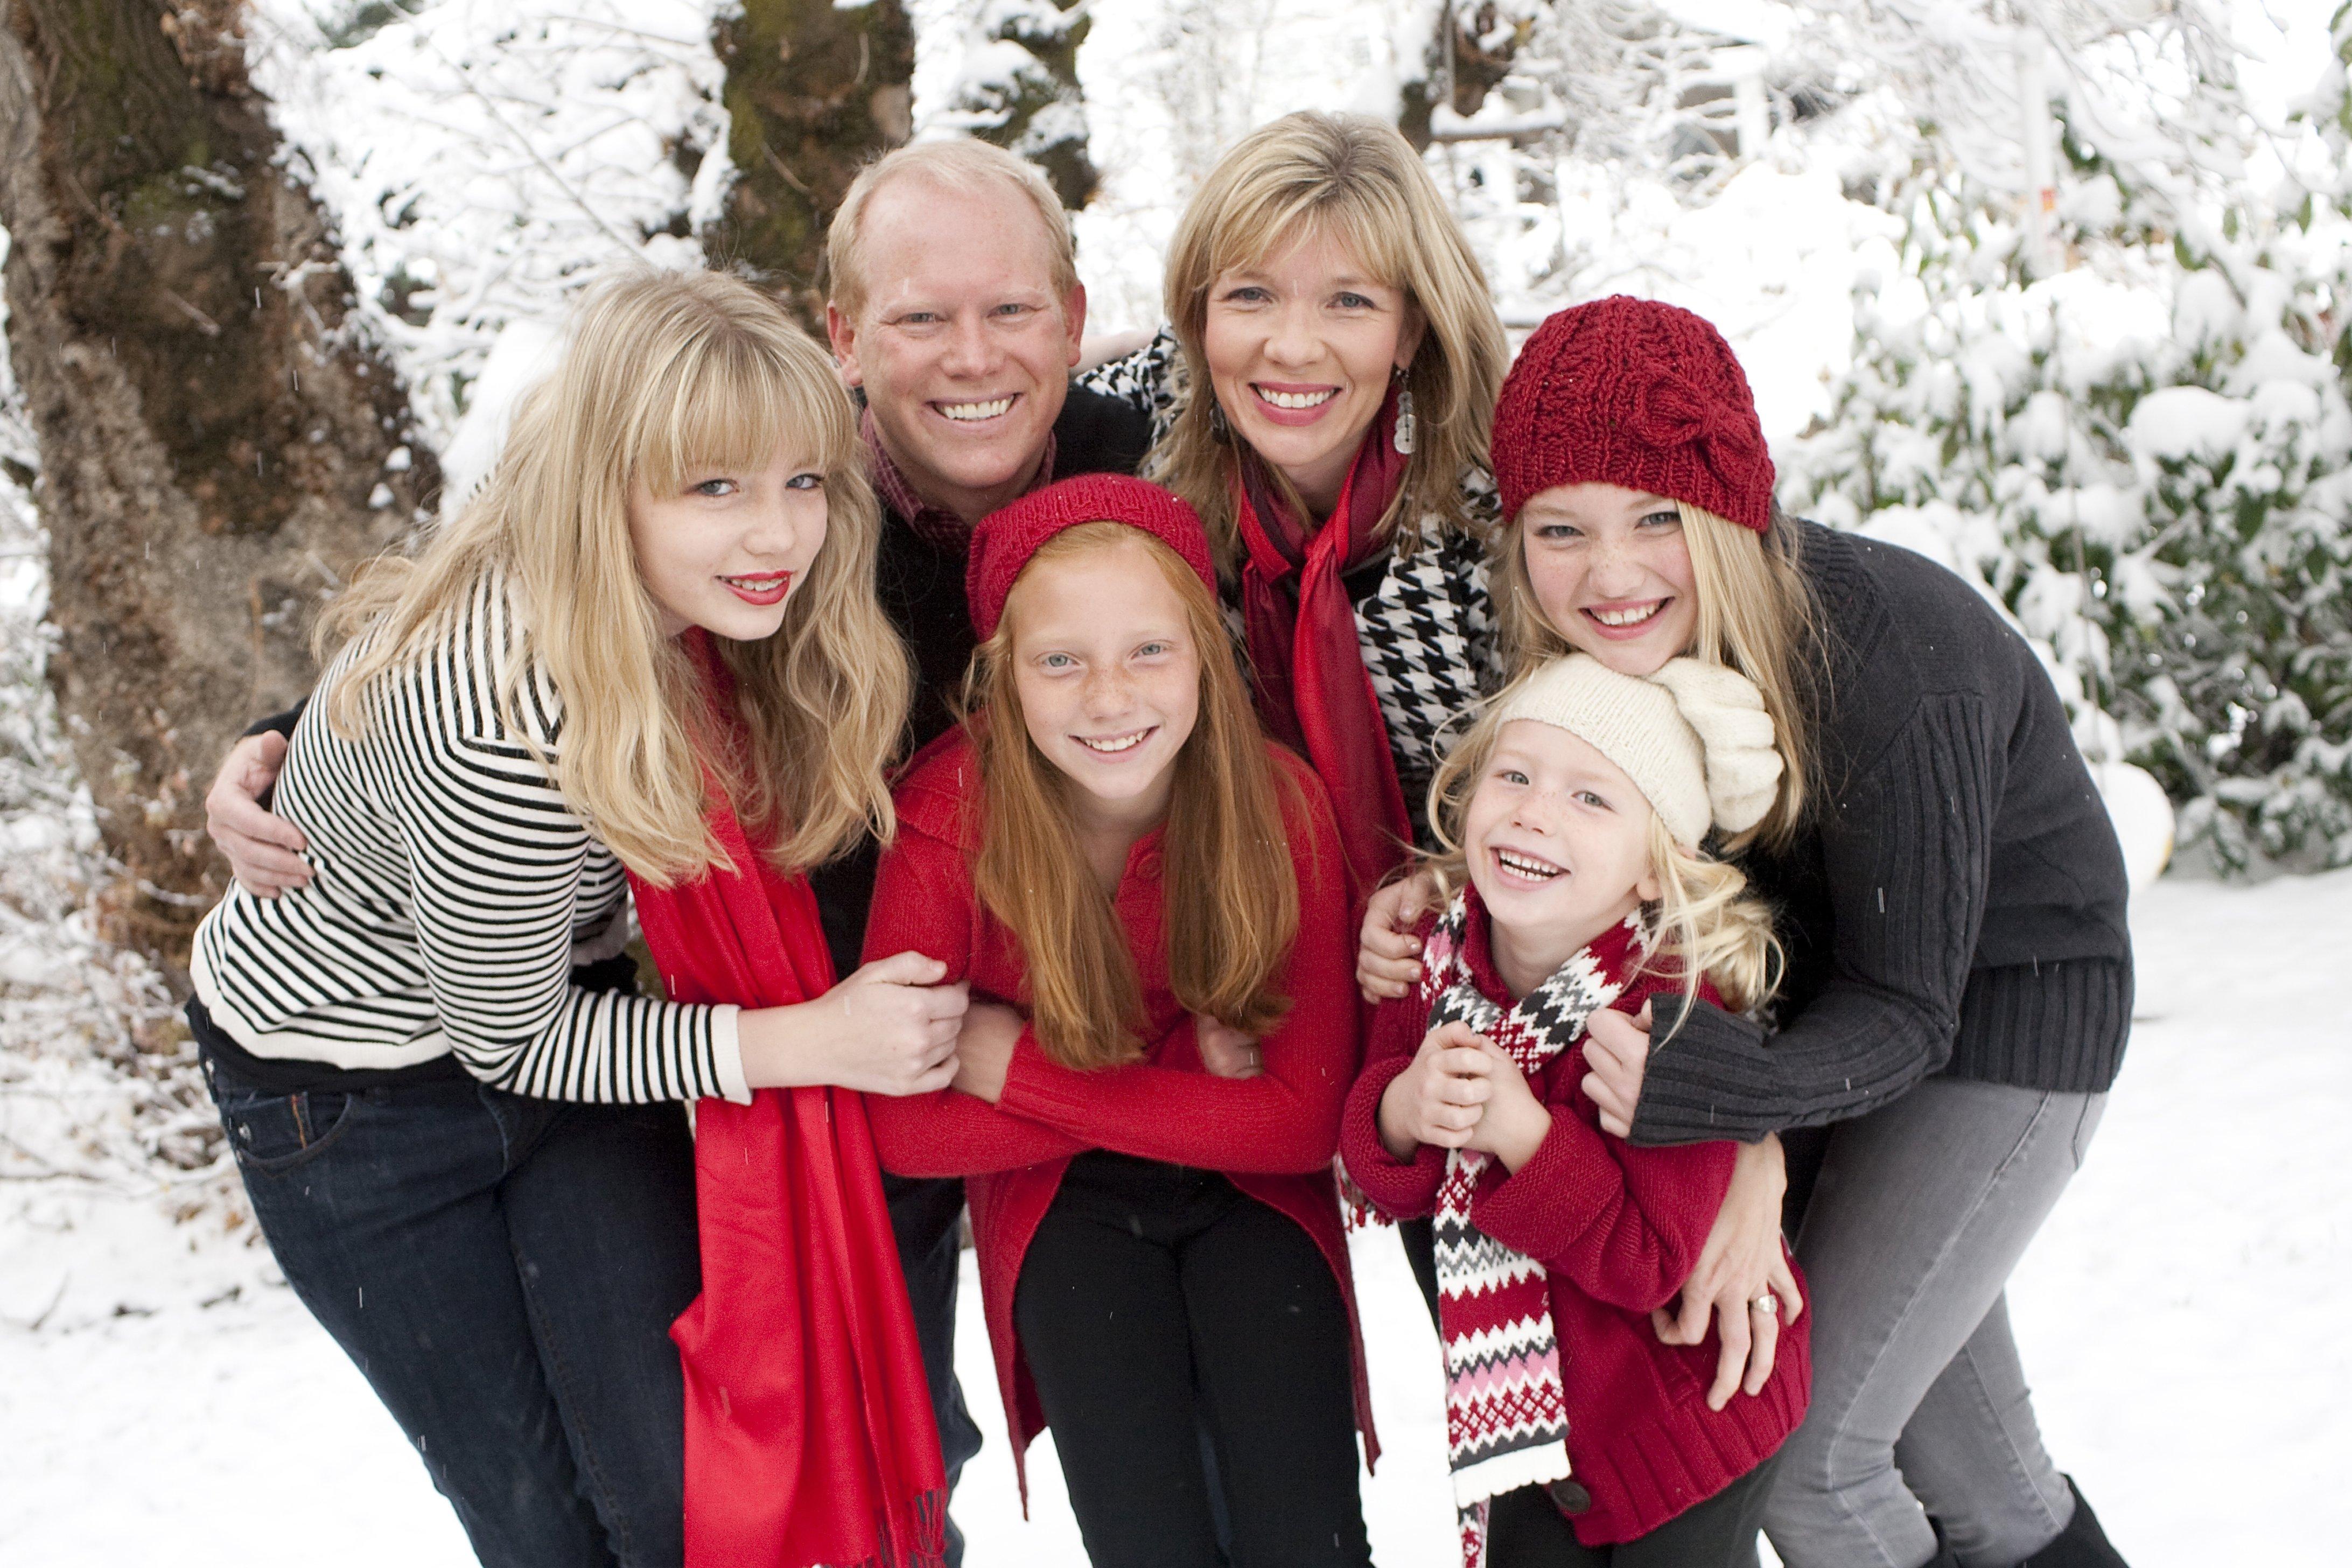 10 Cute Cute Family Christmas Picture Ideas christmas ideas becuo home art decor 42110 2020